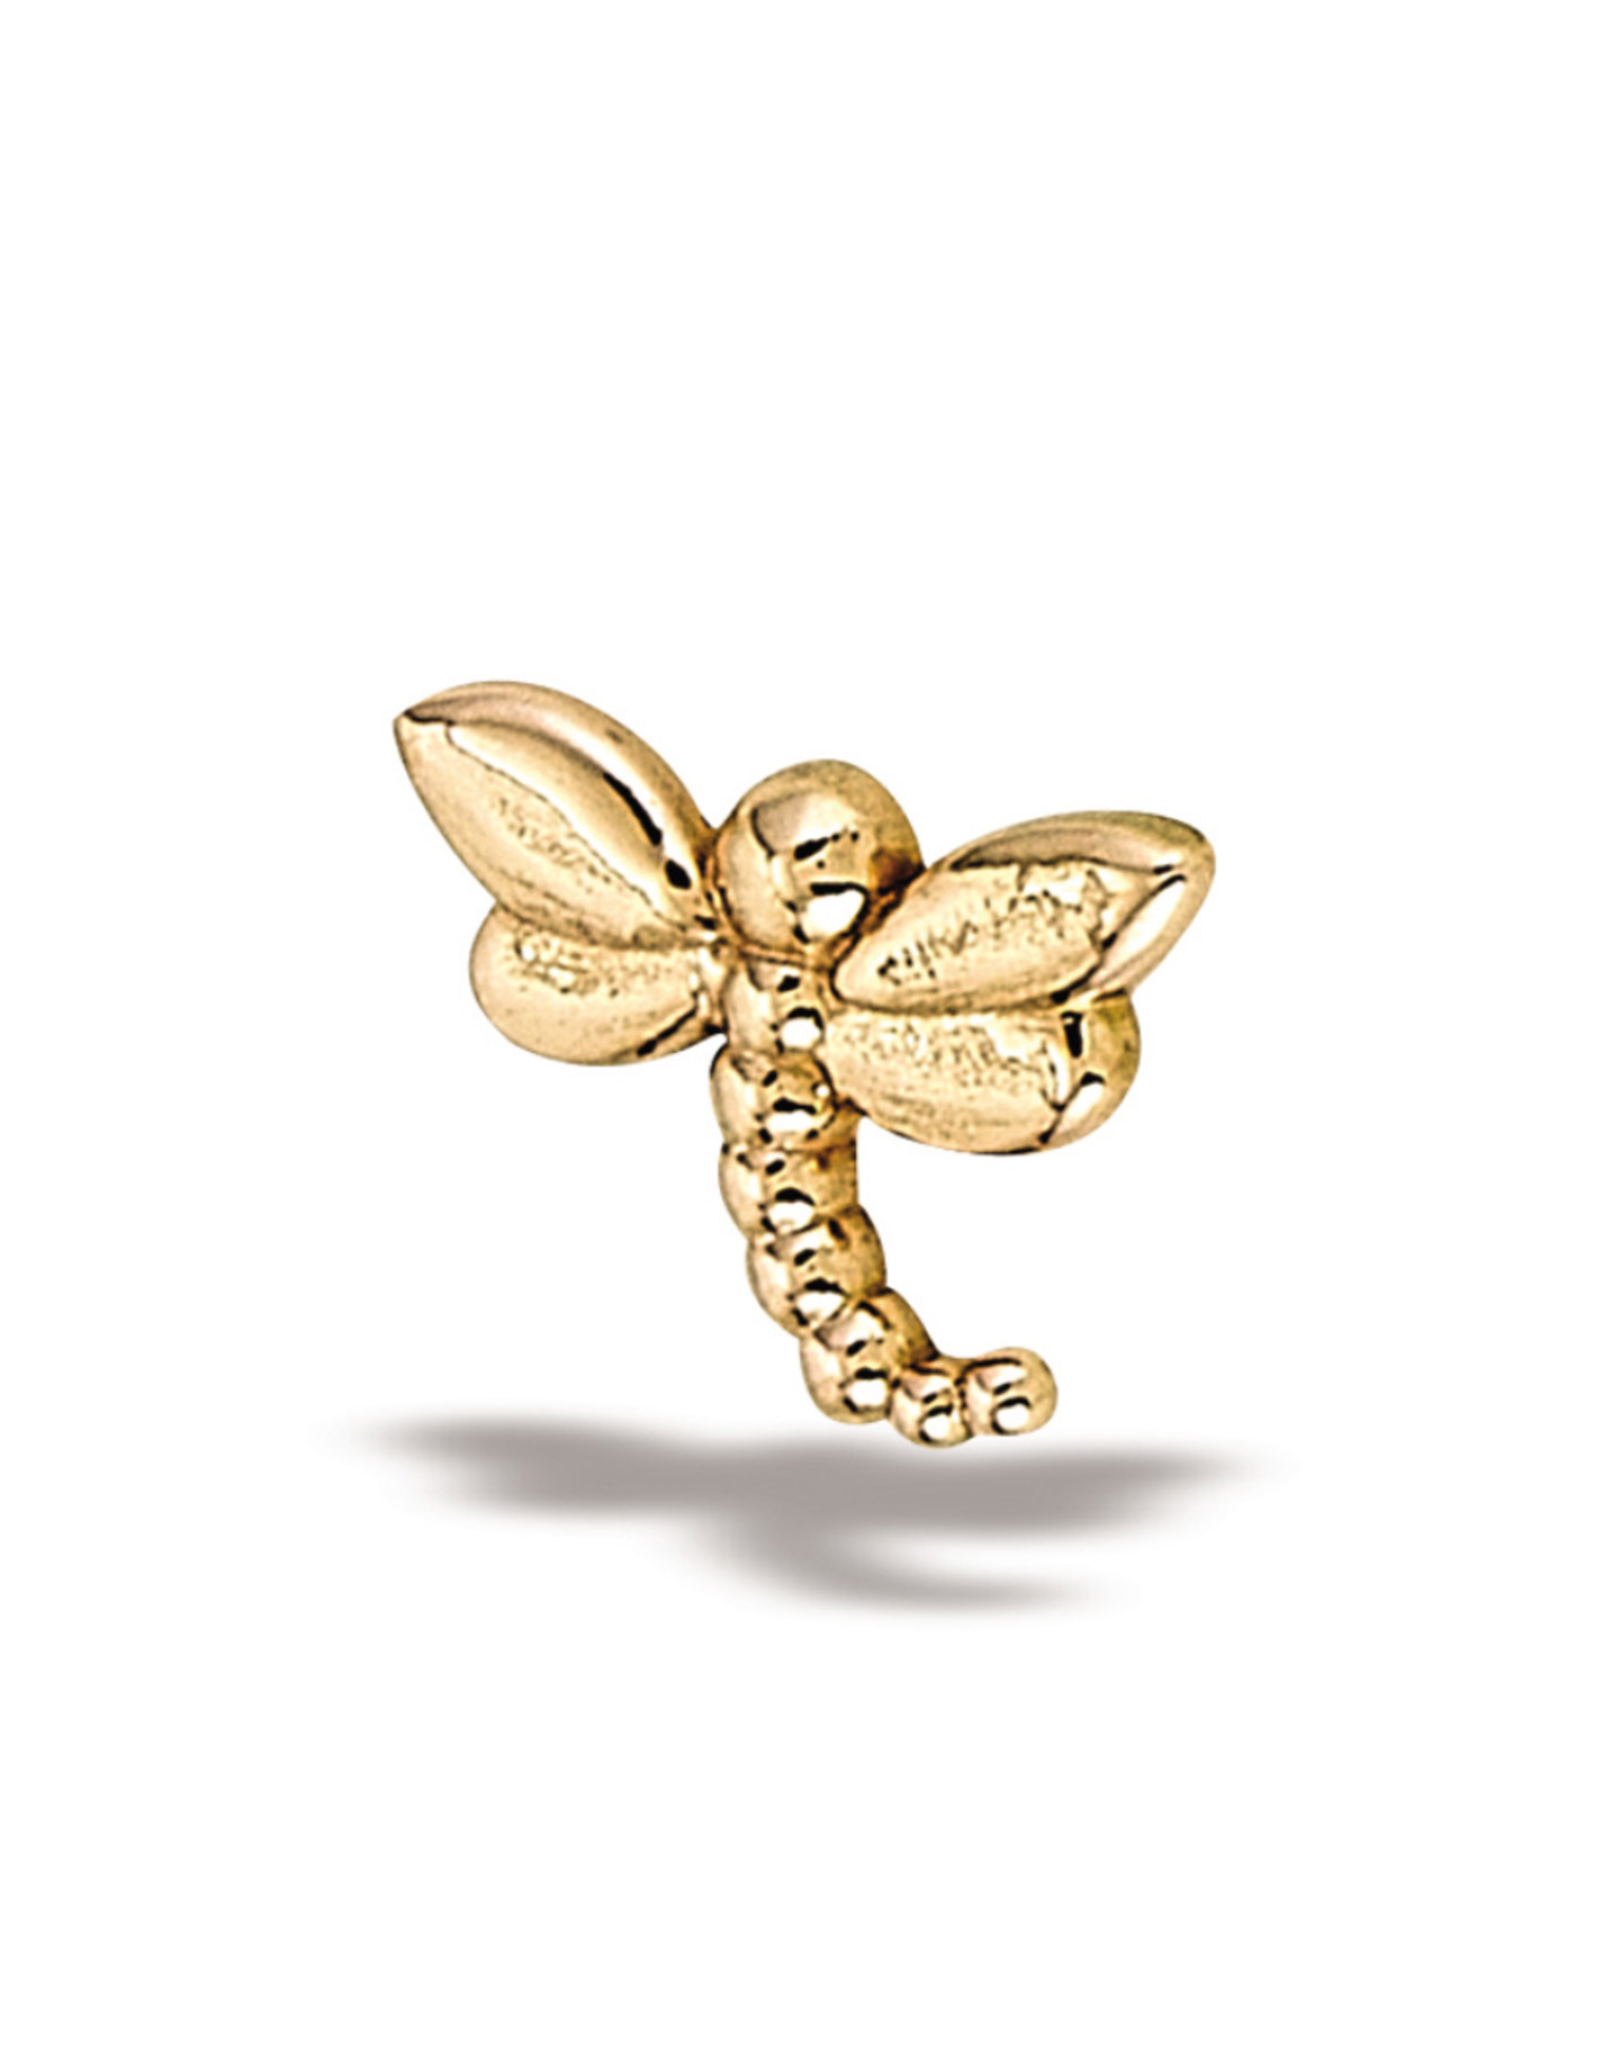 14k RG LG Dragonfly (7.5mmx5.5) Threadless Pin